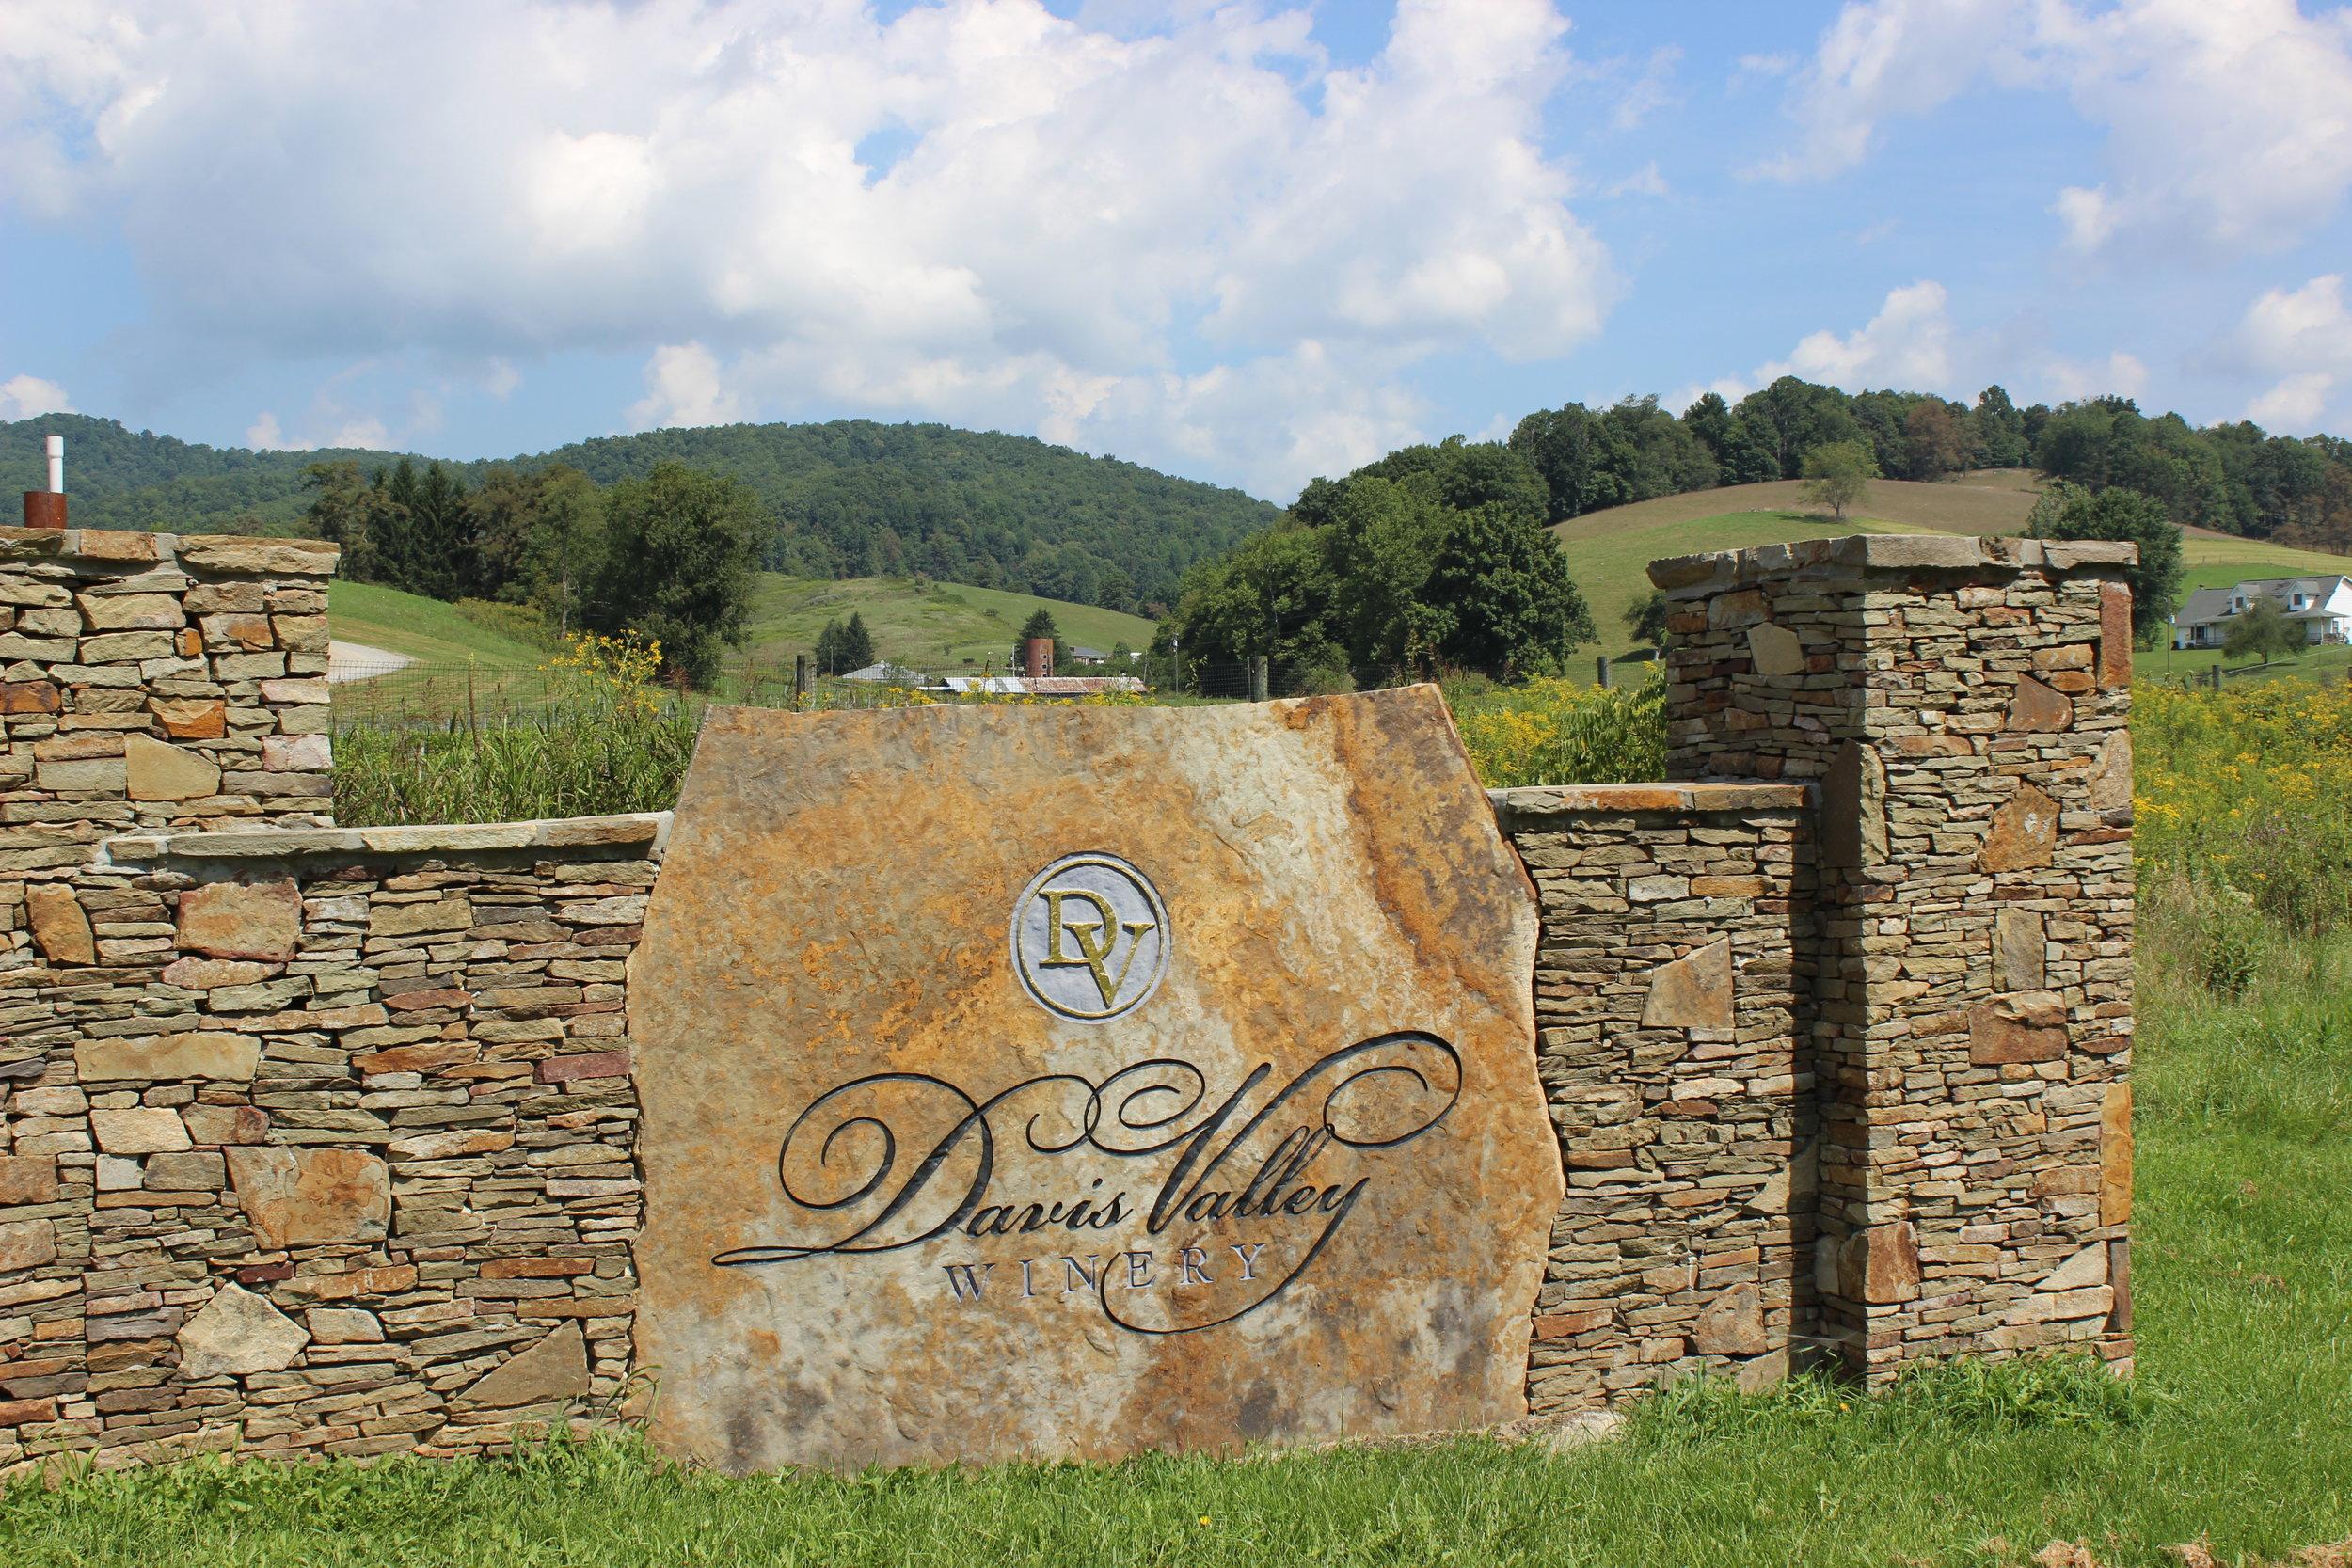 Davis Valley Winery